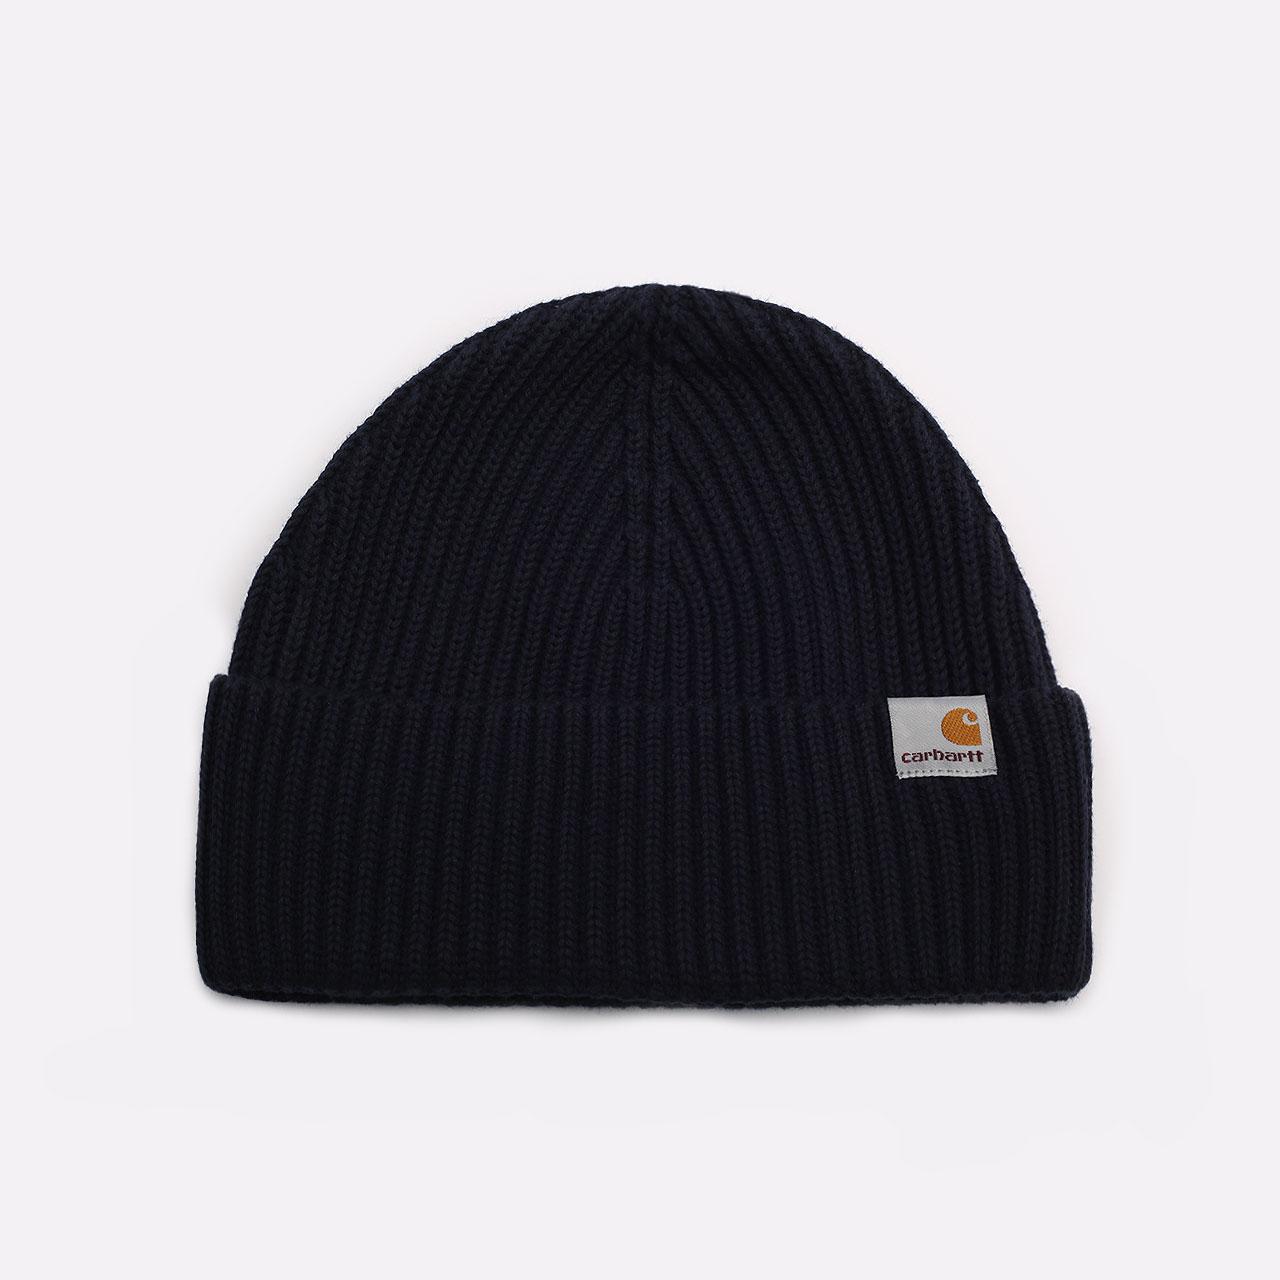 синяя шапка Carhartt WIP Burbank Beanie I029491-dark navy - цена, описание, фото 1